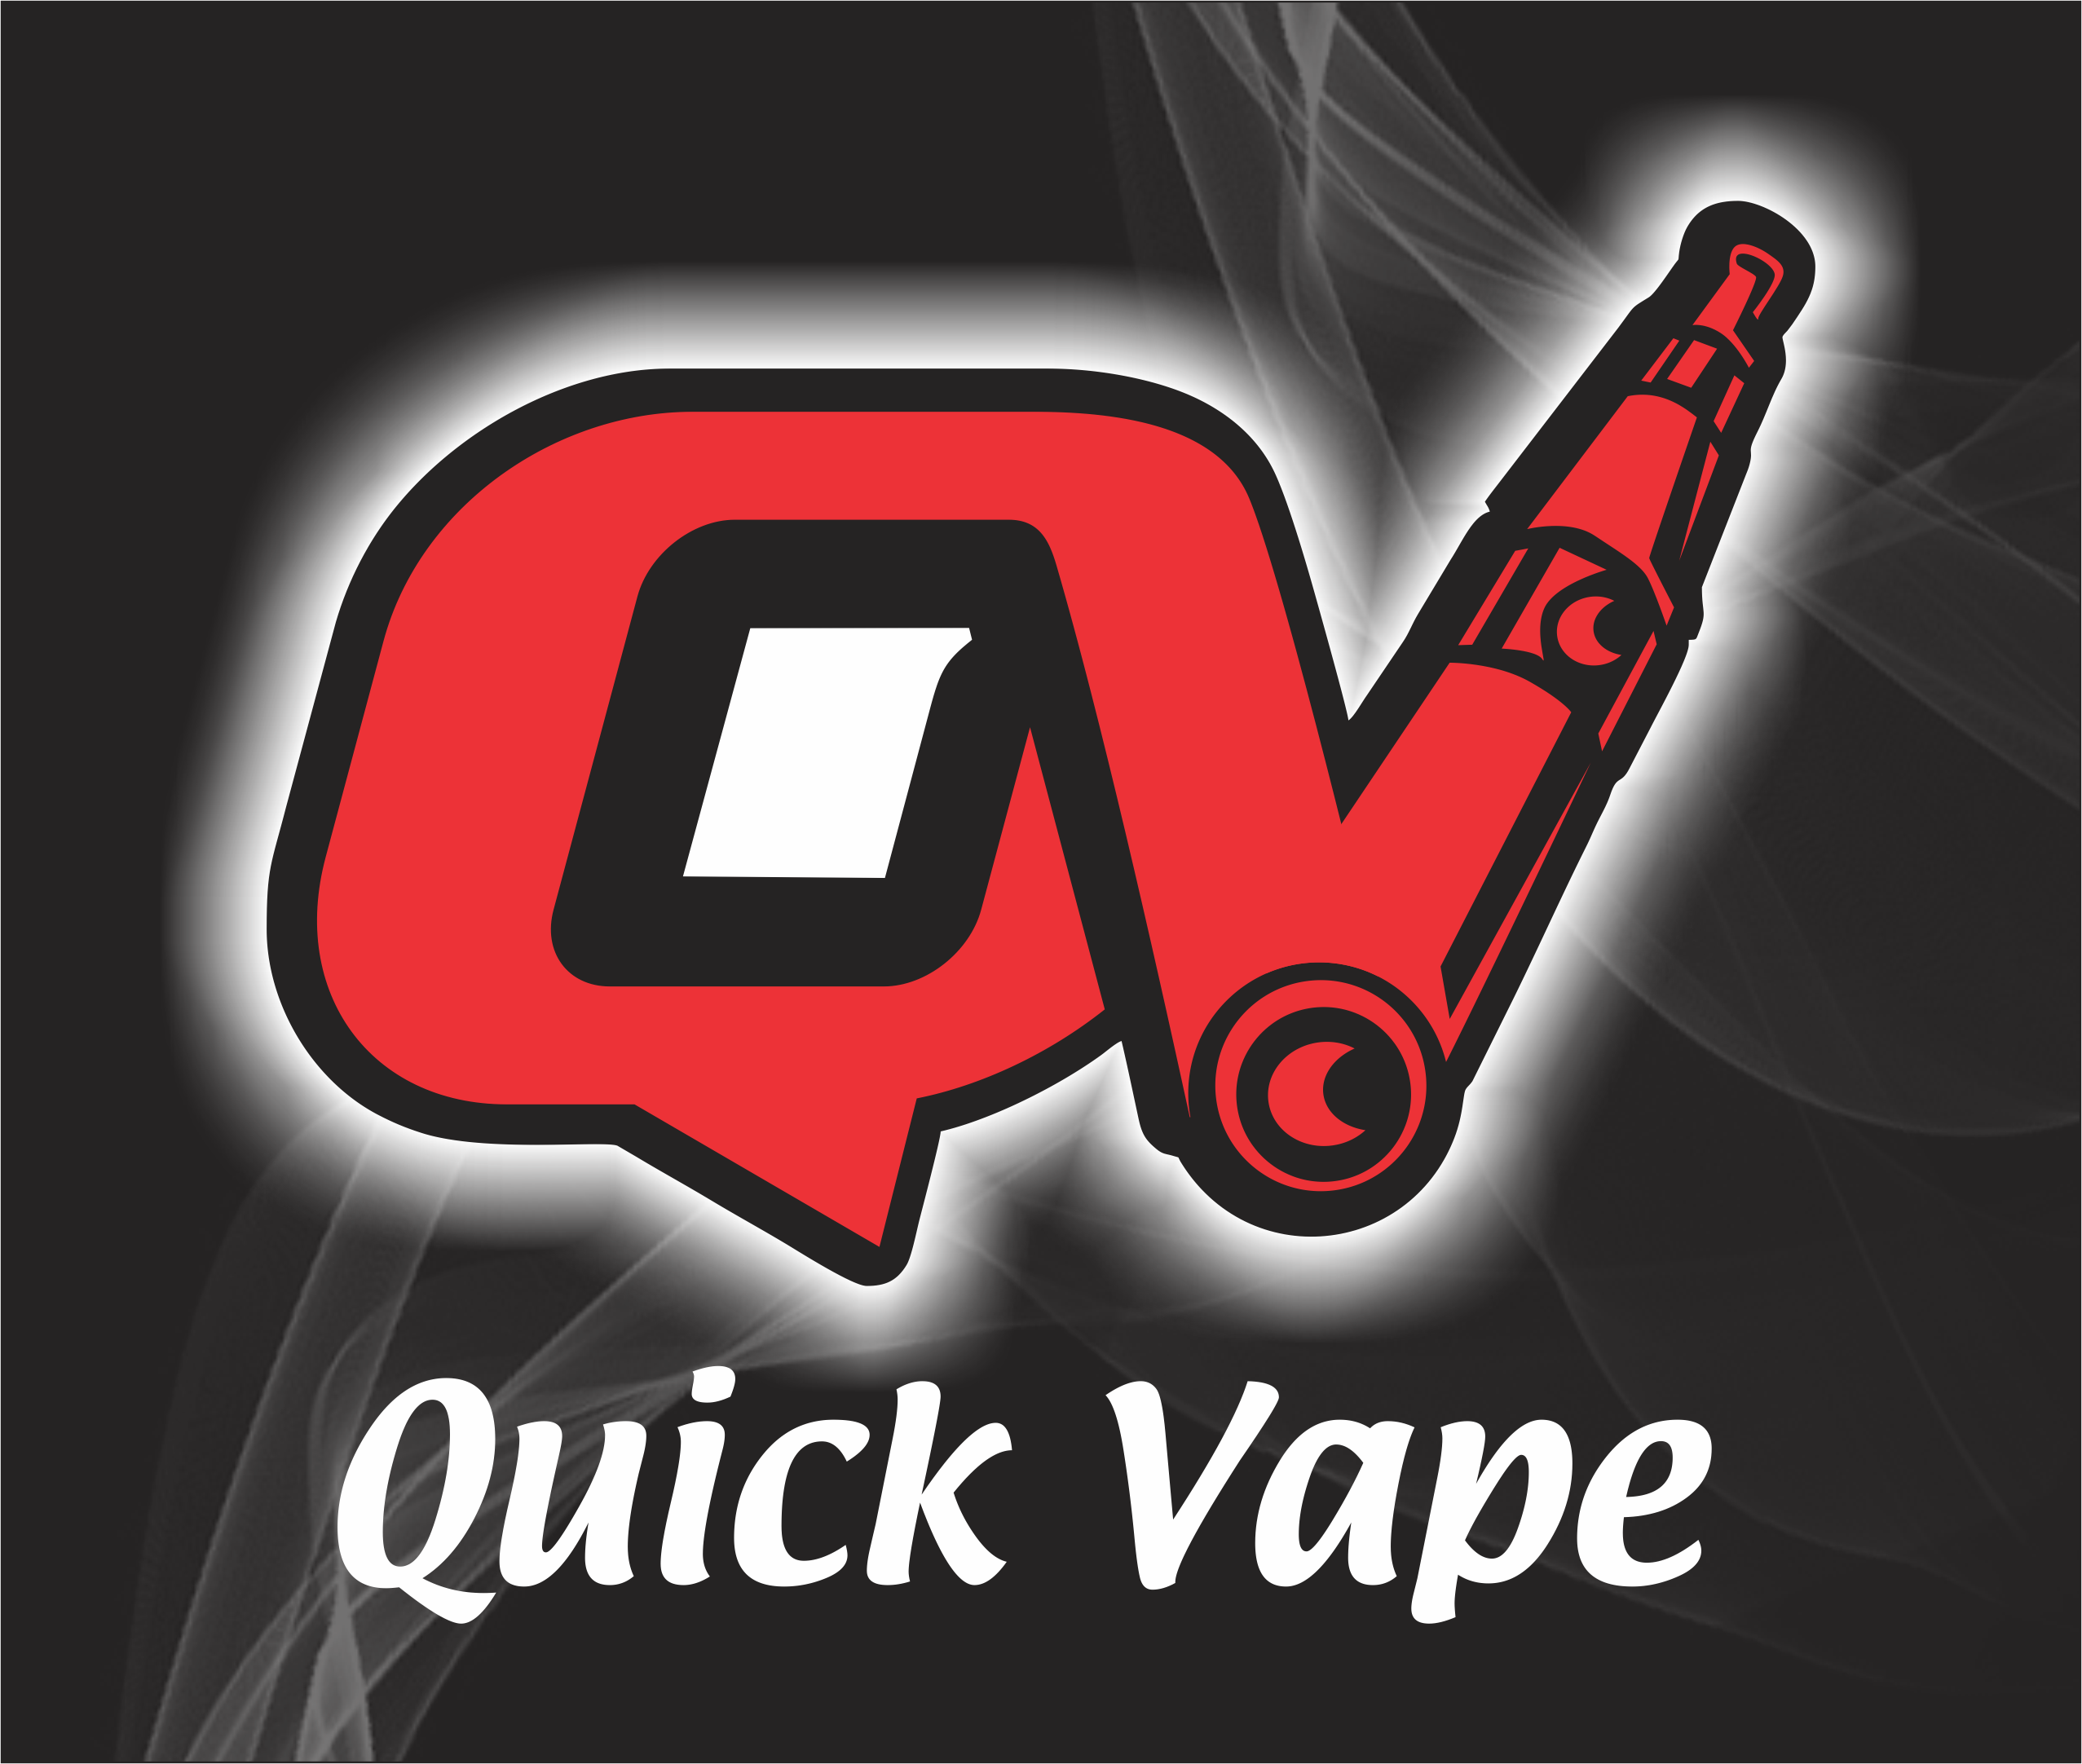 Quick Vape Lounge